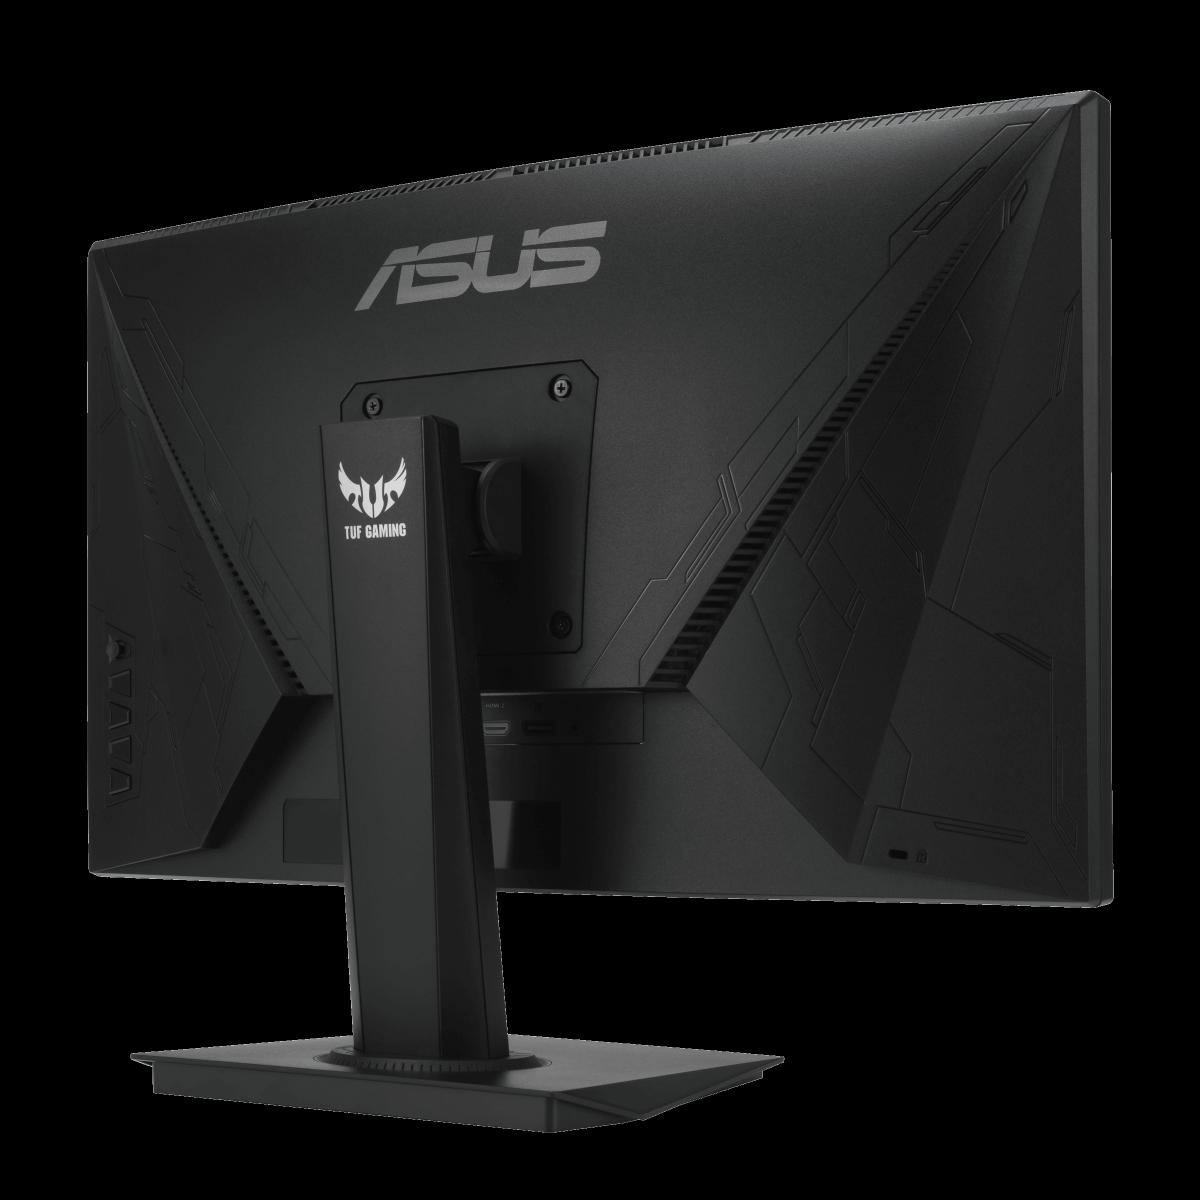 Monitor Gamer Asus TUF Gaming Led 23,6 Pol, Curvo, Full HD, 165Hz, 1ms, IPS, FreeSync Premium, Shadow Boost, VG24VQE